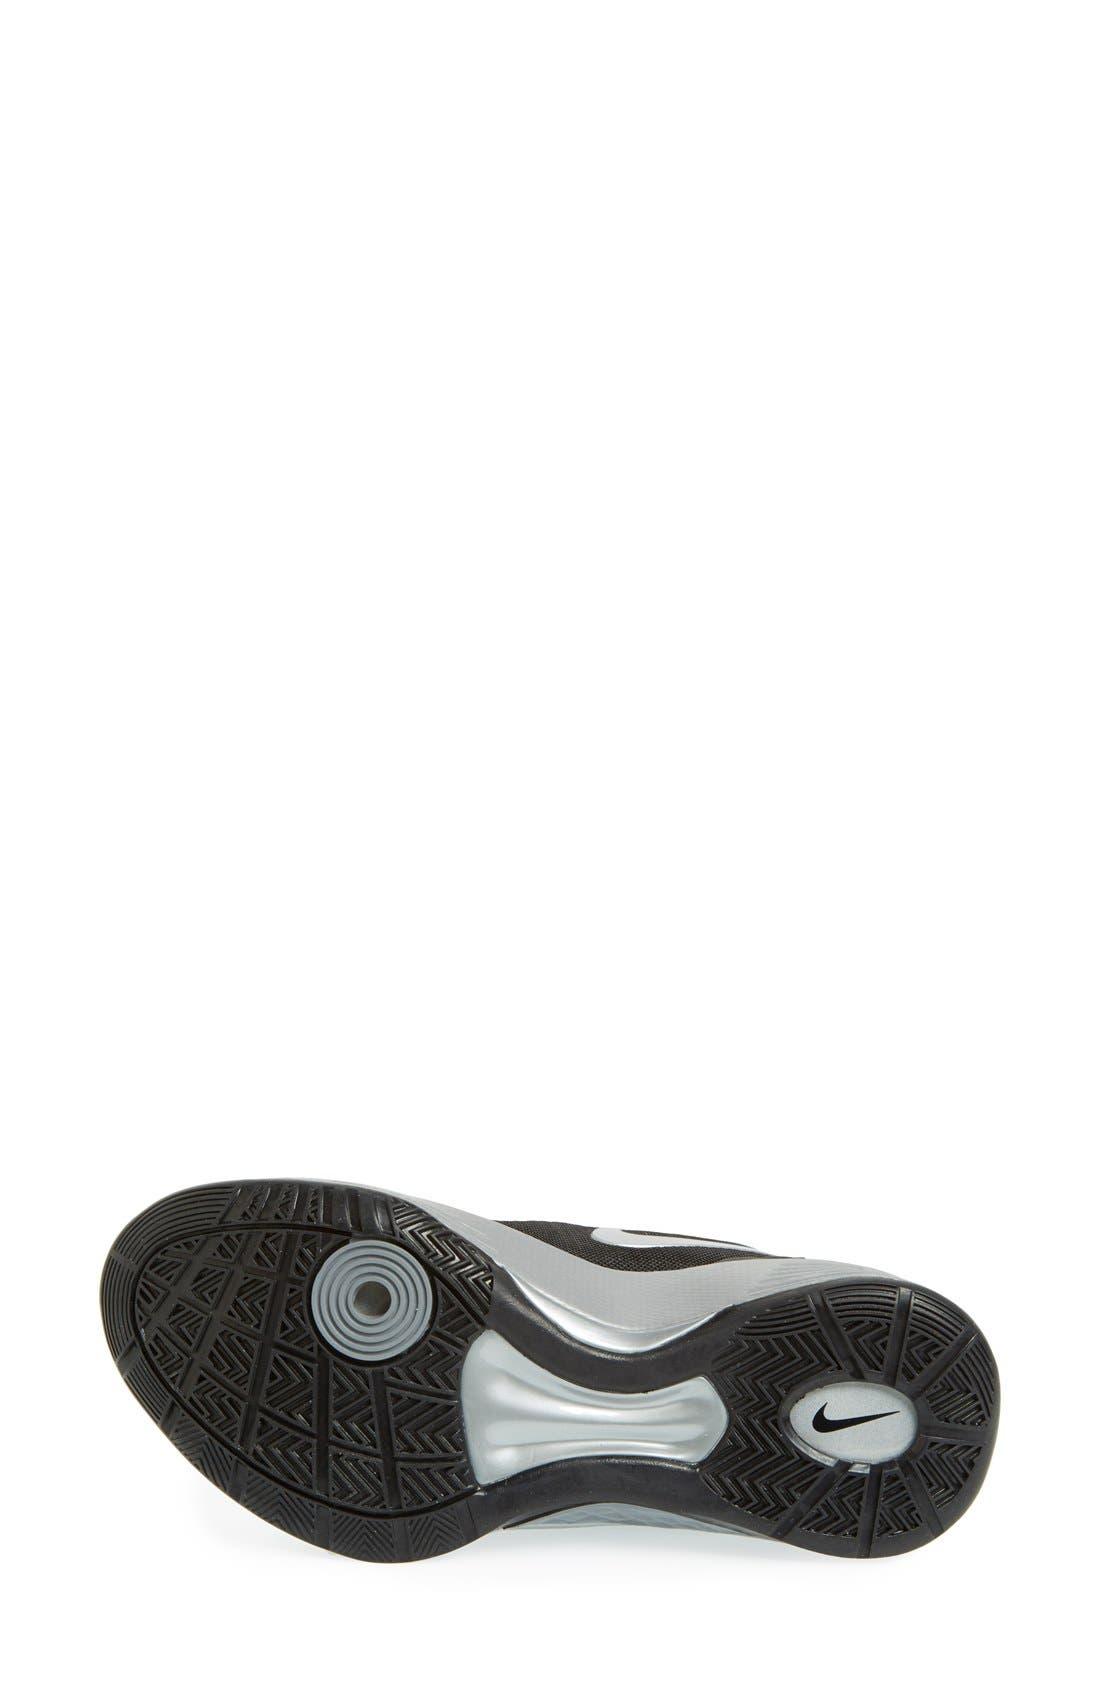 Alternate Image 4  - Nike 'Zoom Hyperspike' Volleyball Shoe (Women)